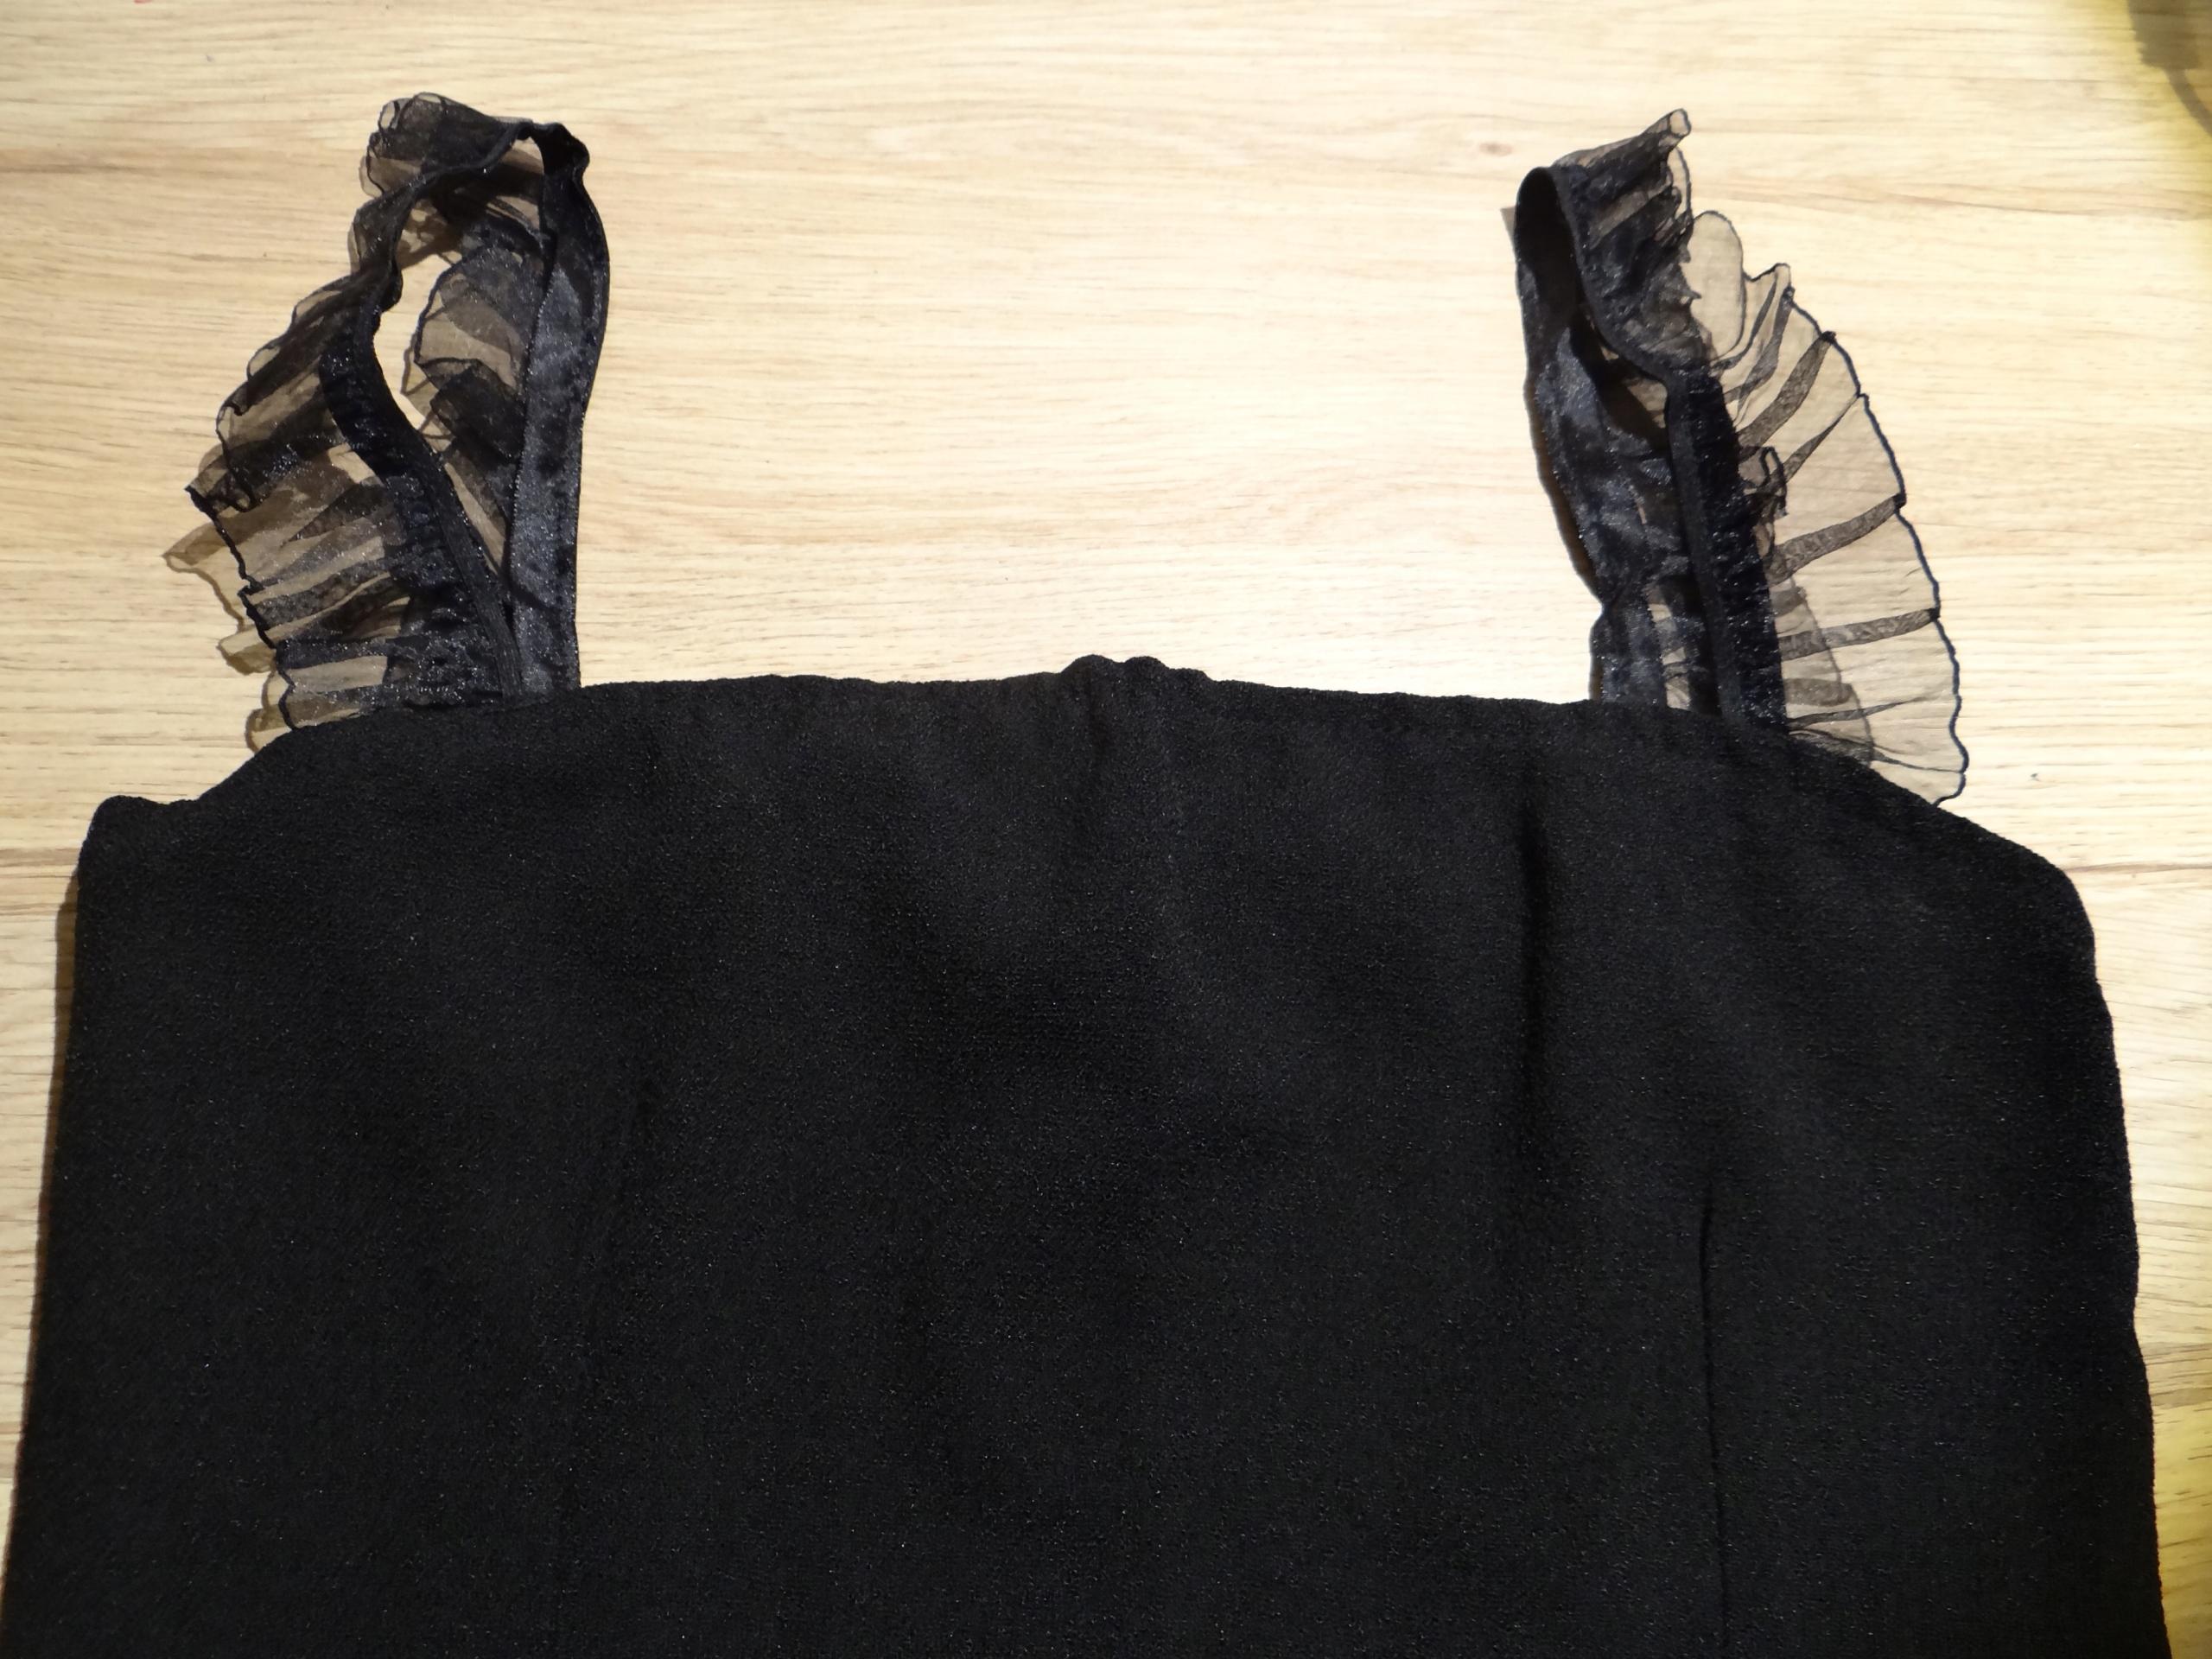 f0d98d78a5 Sukienka mała czarna midi 36   38 - OKAZJA- - 7728707838 - oficjalne ...